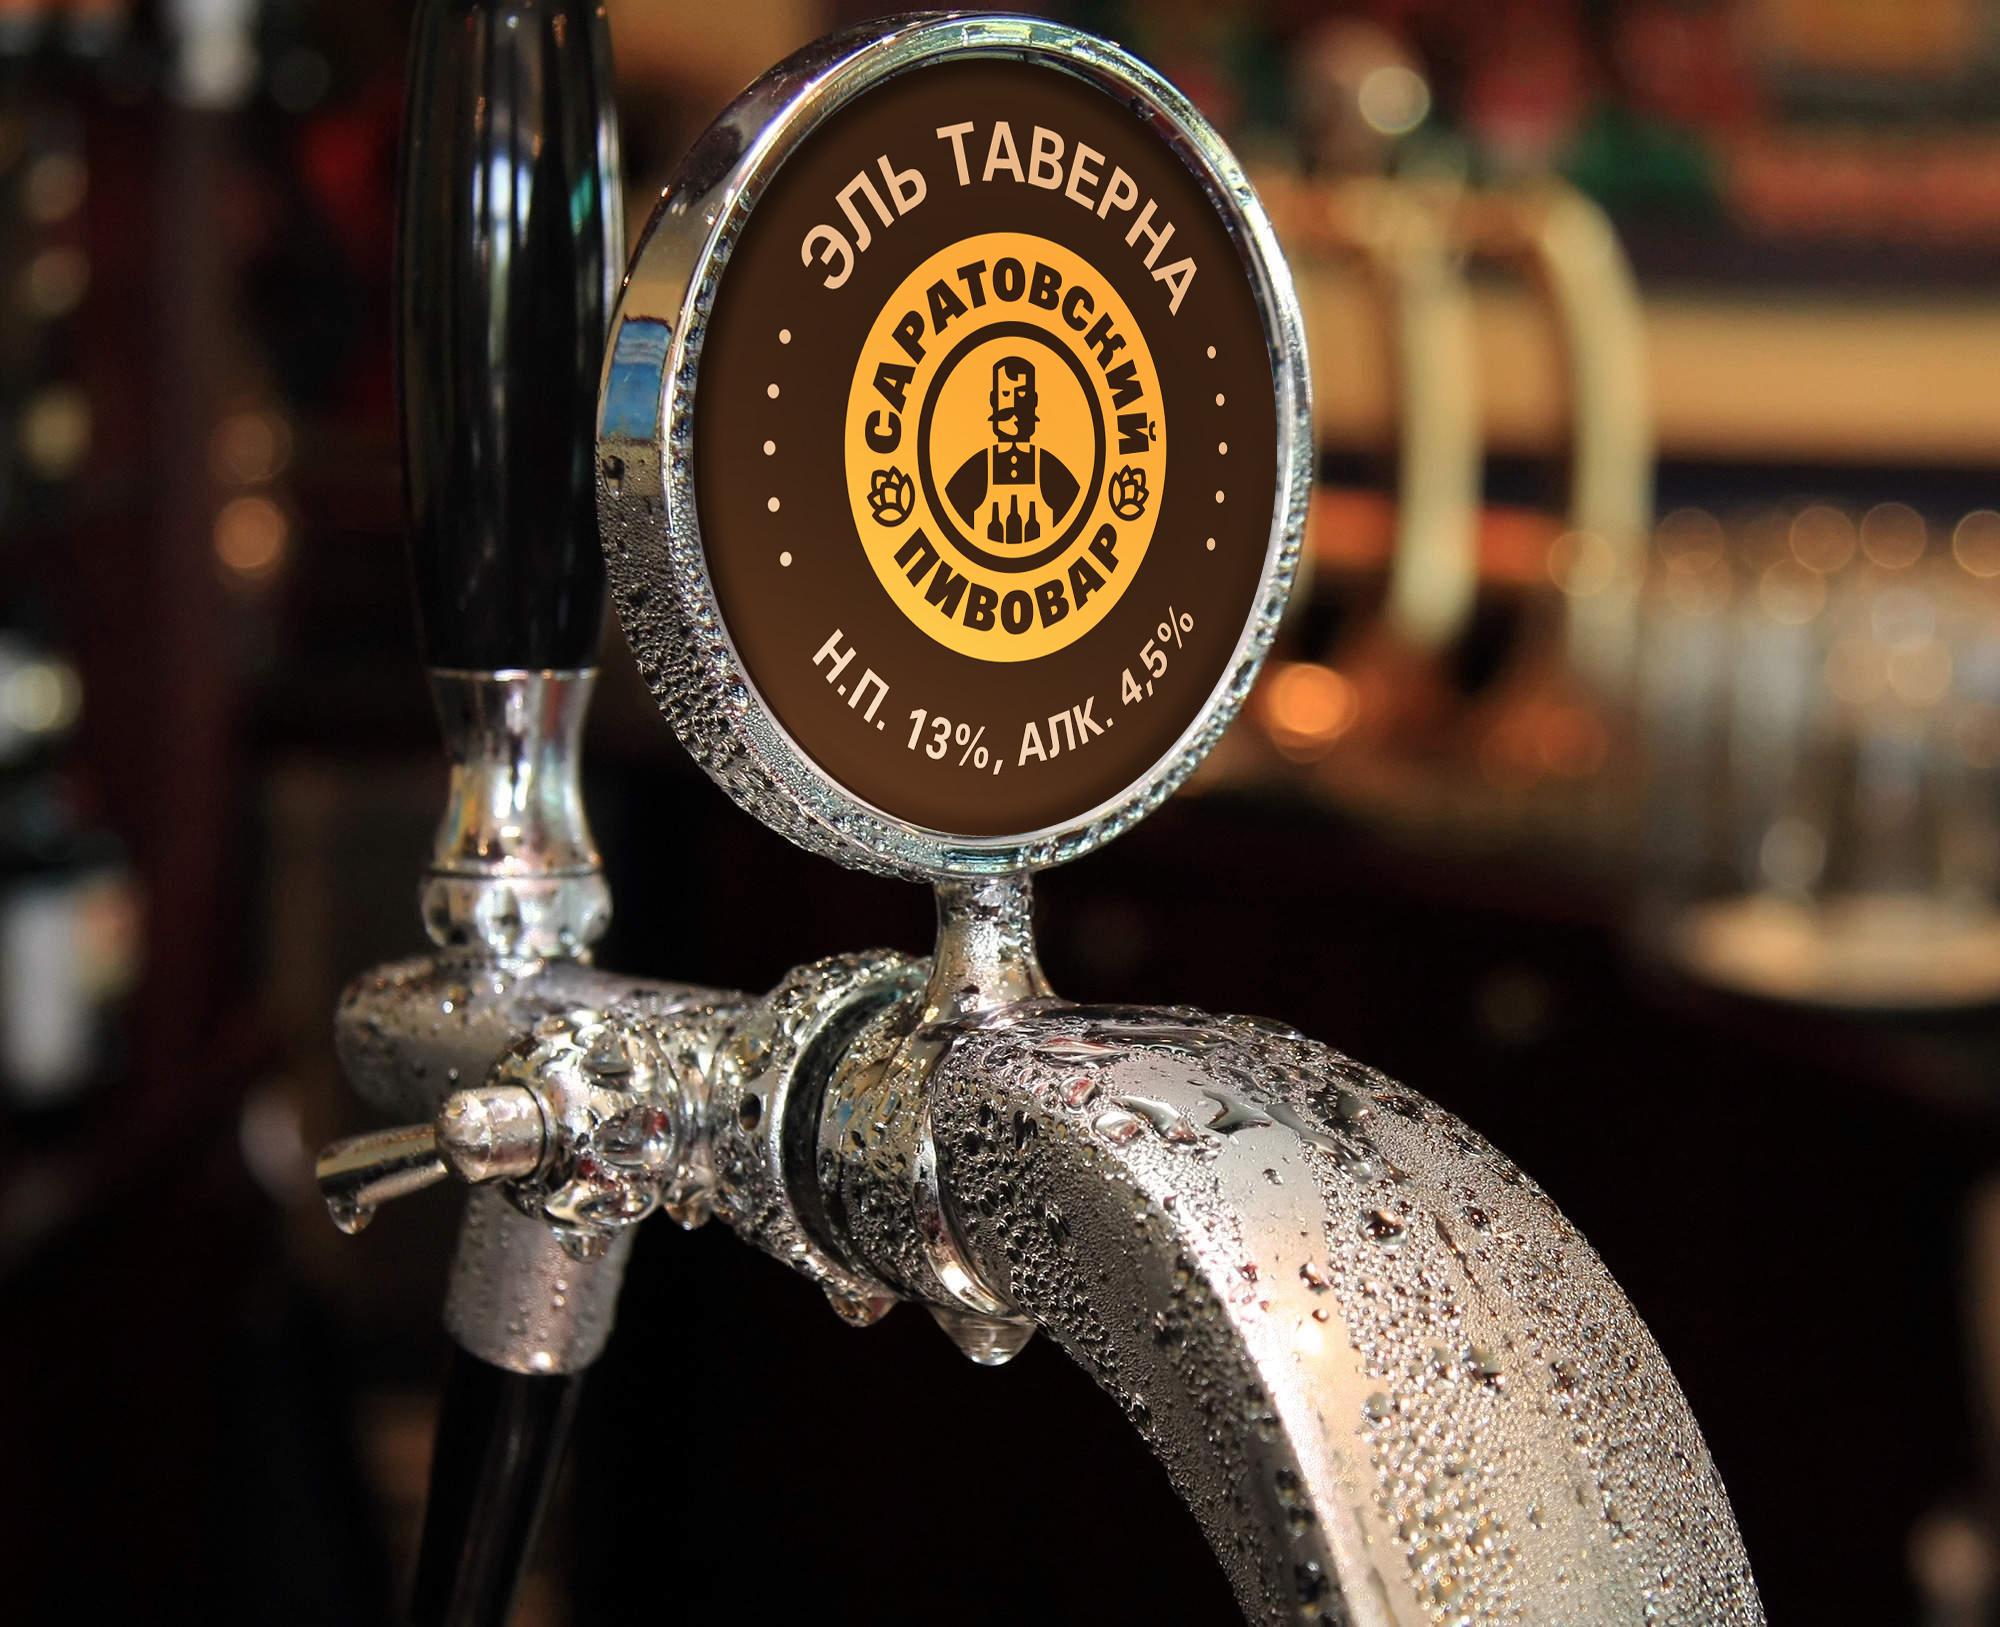 Разработка логотипа для частной пивоварни фото f_2415d7a99044c44f.jpg